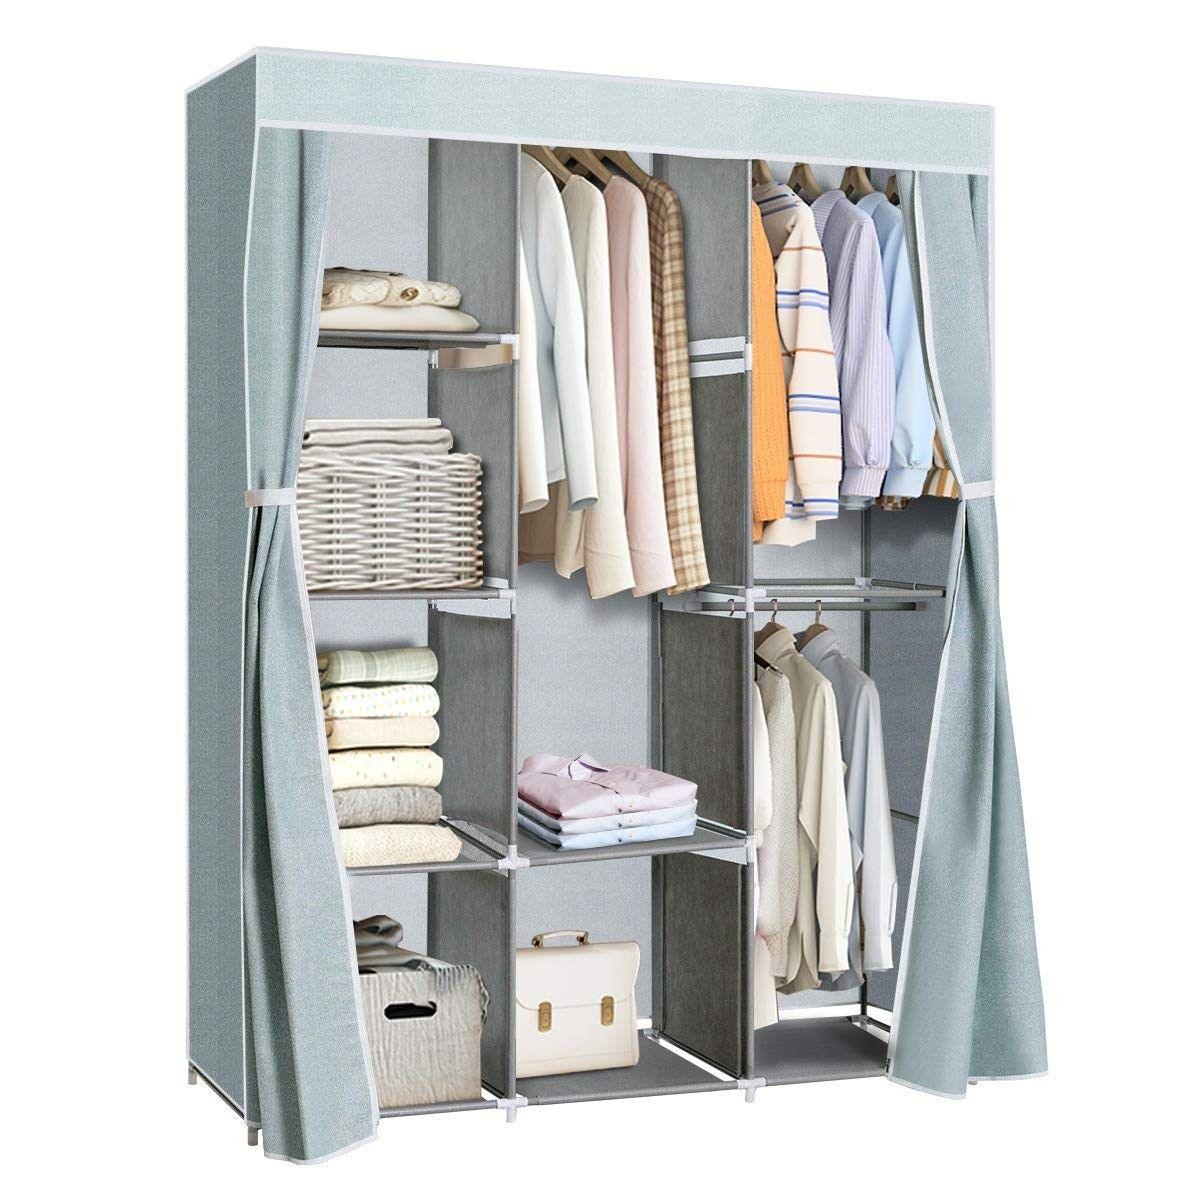 Portable Clothes Closet Storage Organizer Clothes Rack 36 95